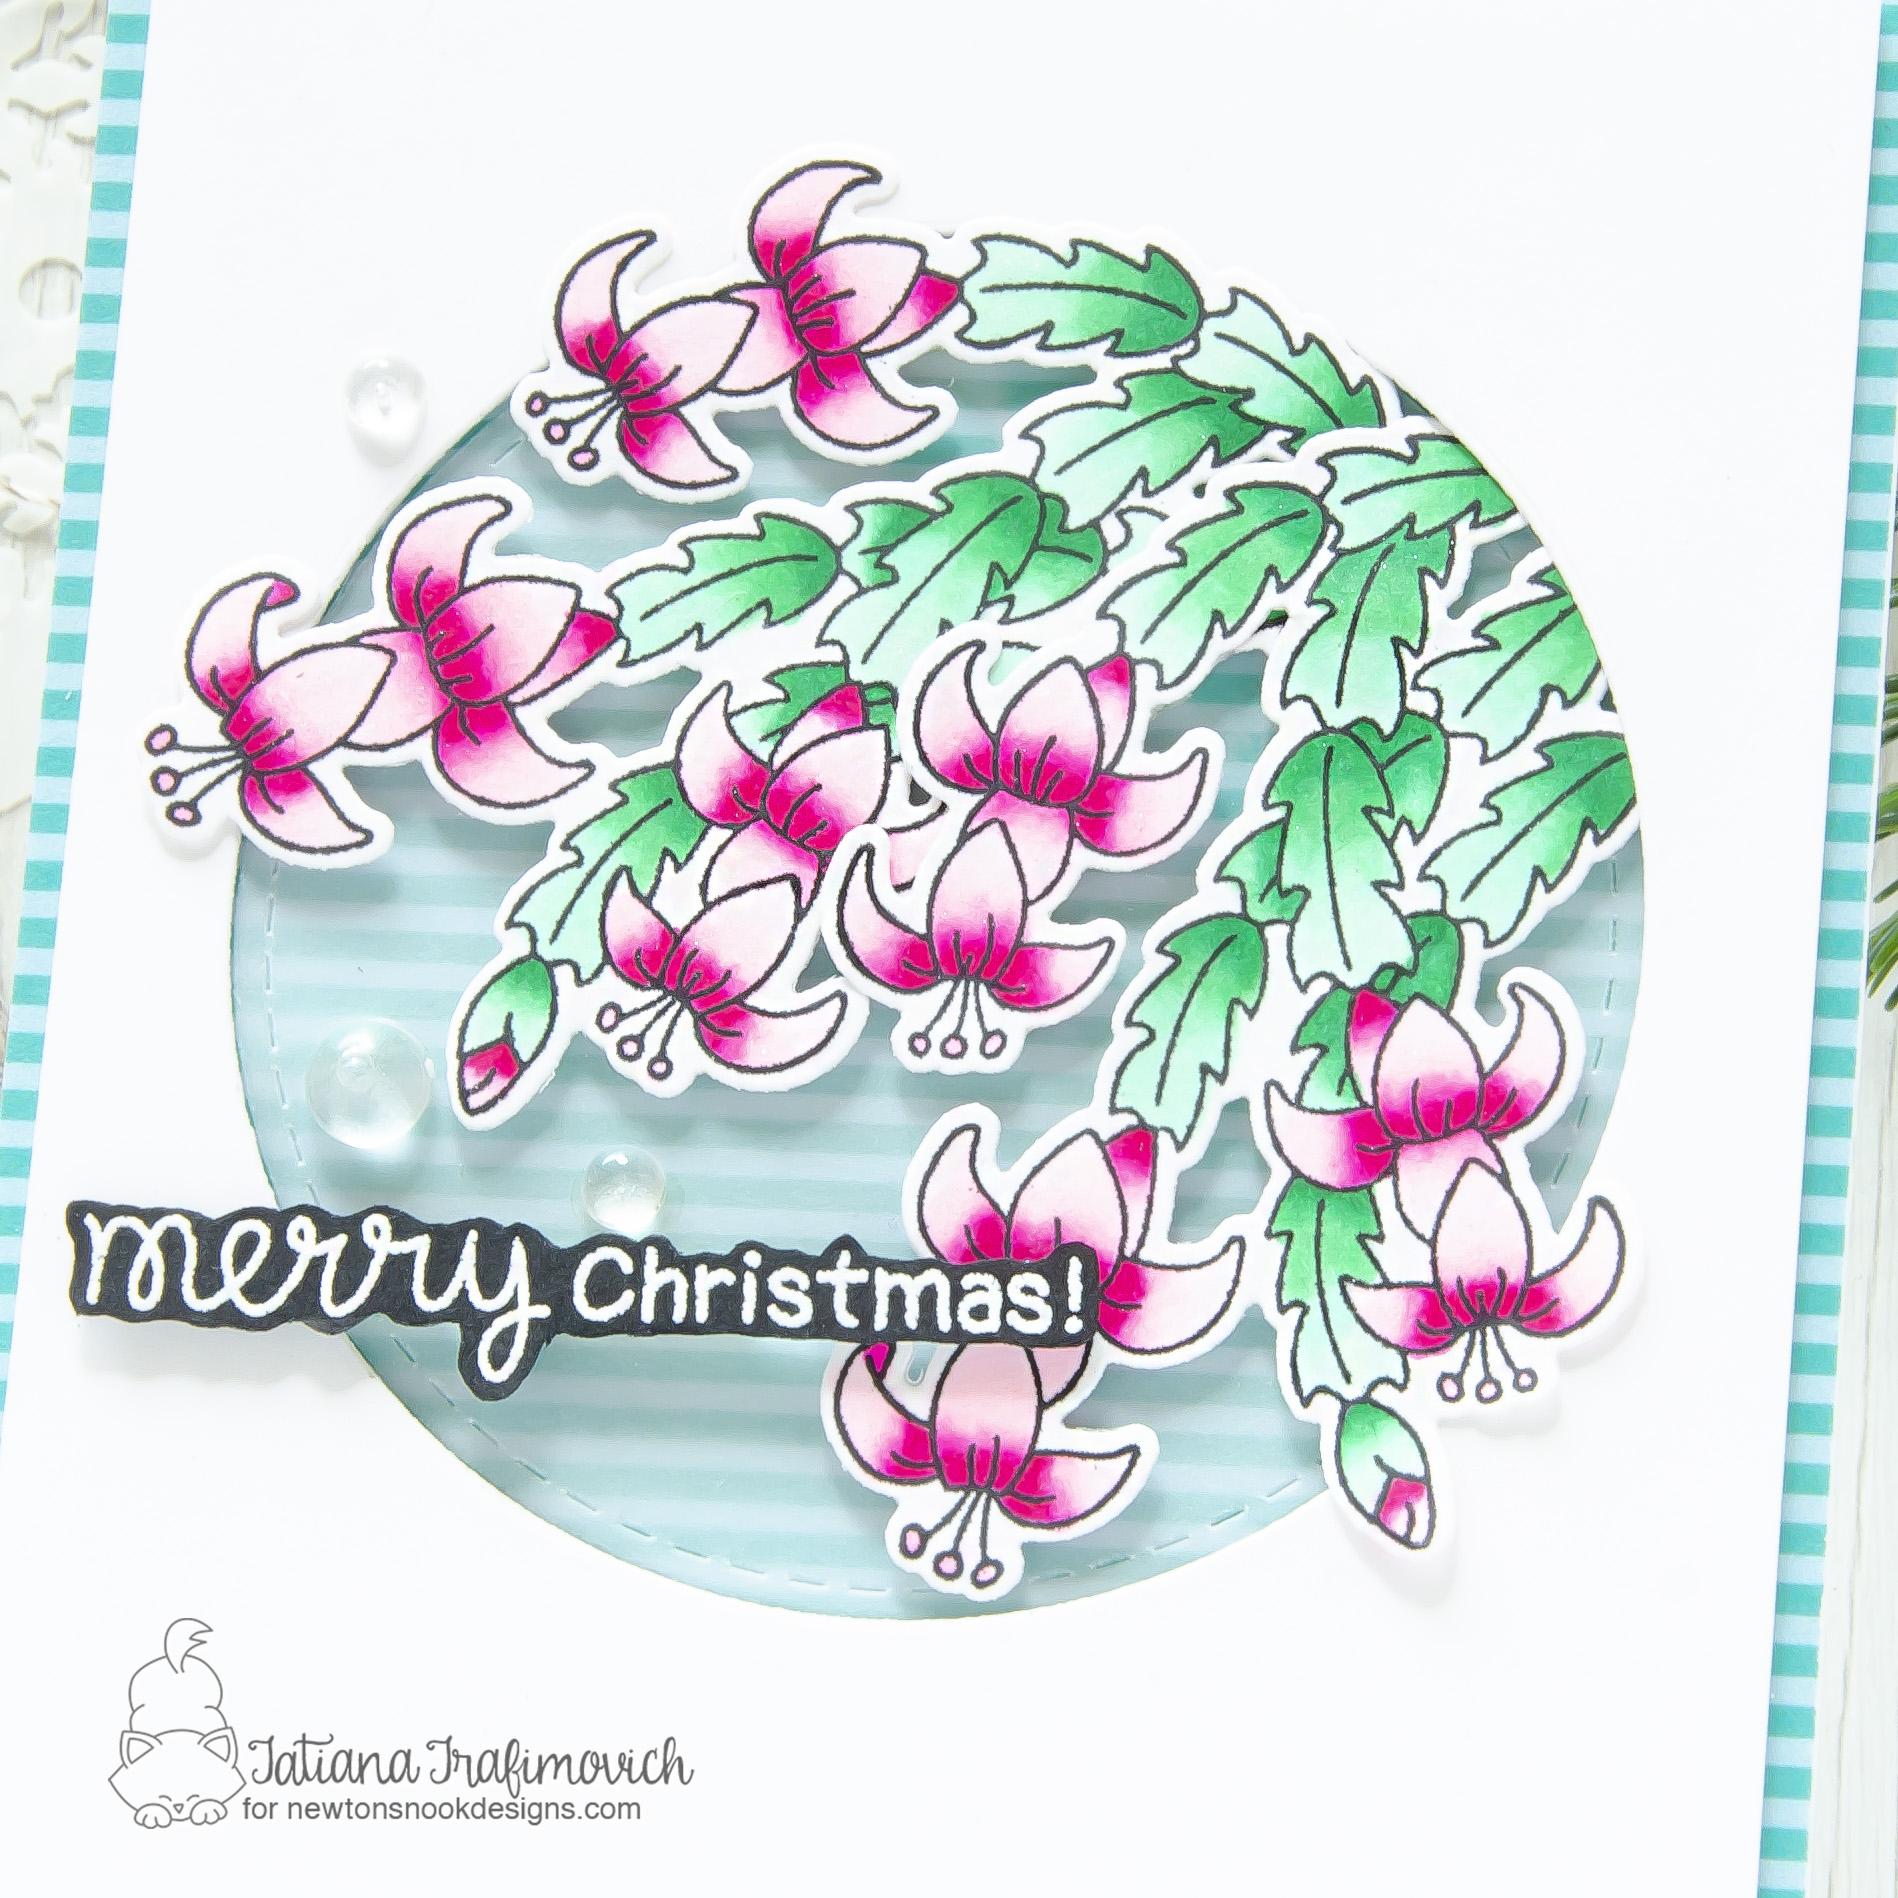 Merry Christmas #handmade card by Tatiana Trafimovich #tatianacraftandart - Christmas Cactus stamp set by Newton's Nook Designs #newtonsnook